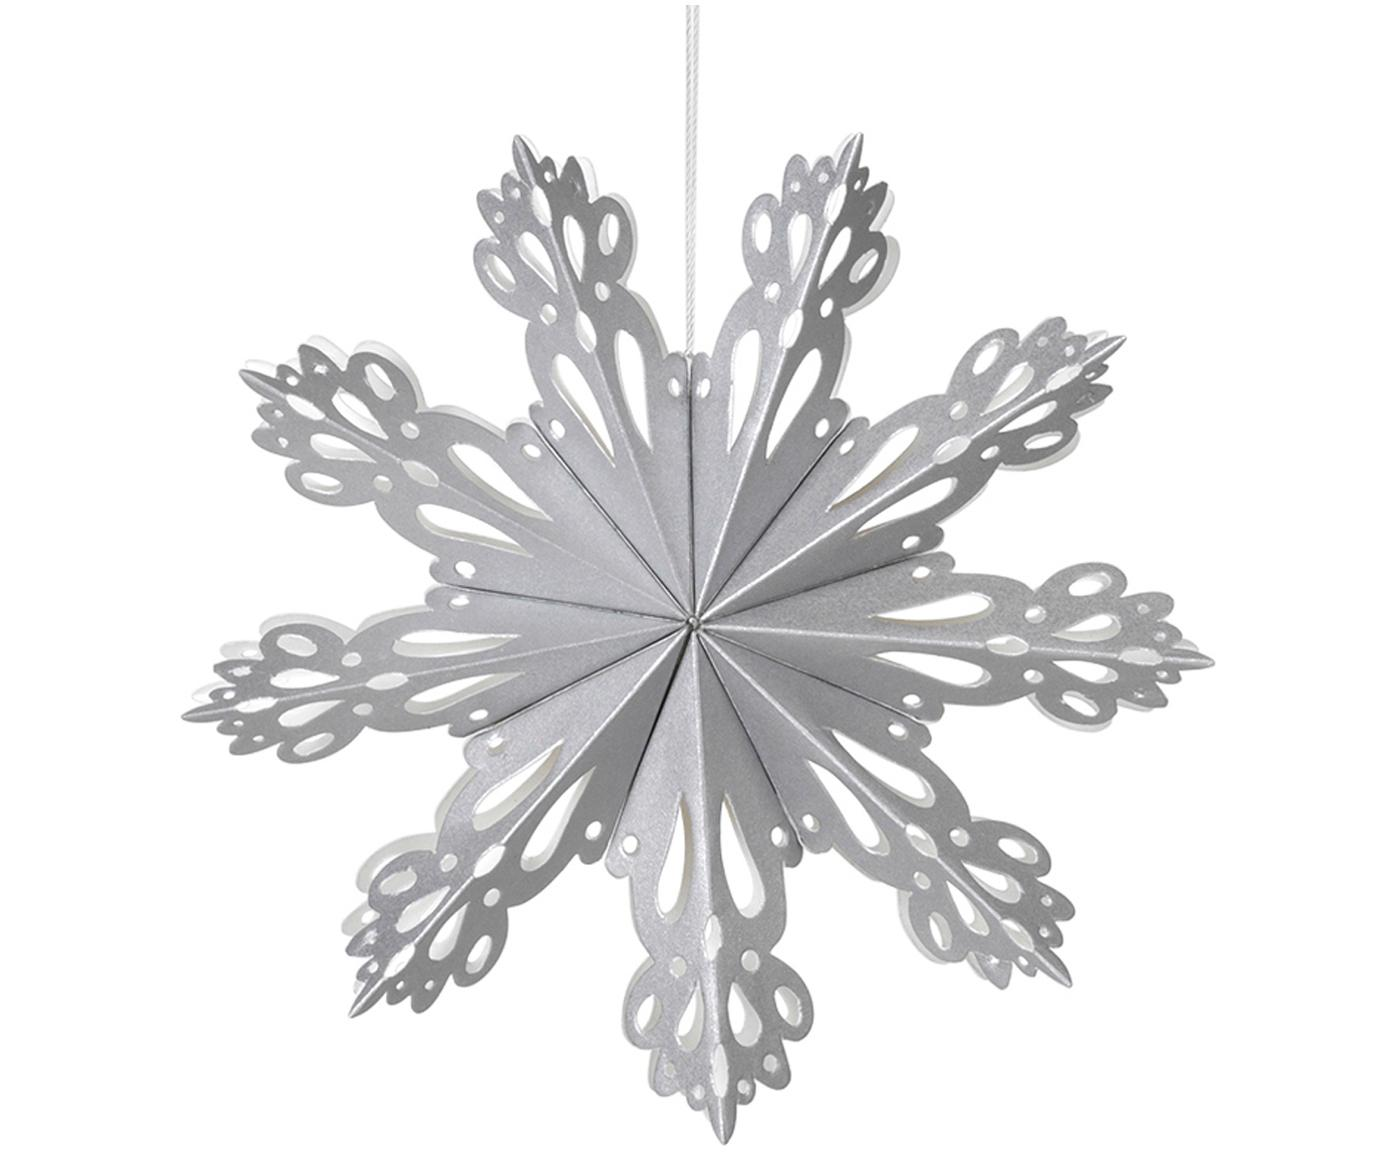 XL-kerstboomhanger Snowflake, Papier, Zilverkleurig, Ø 15 cm